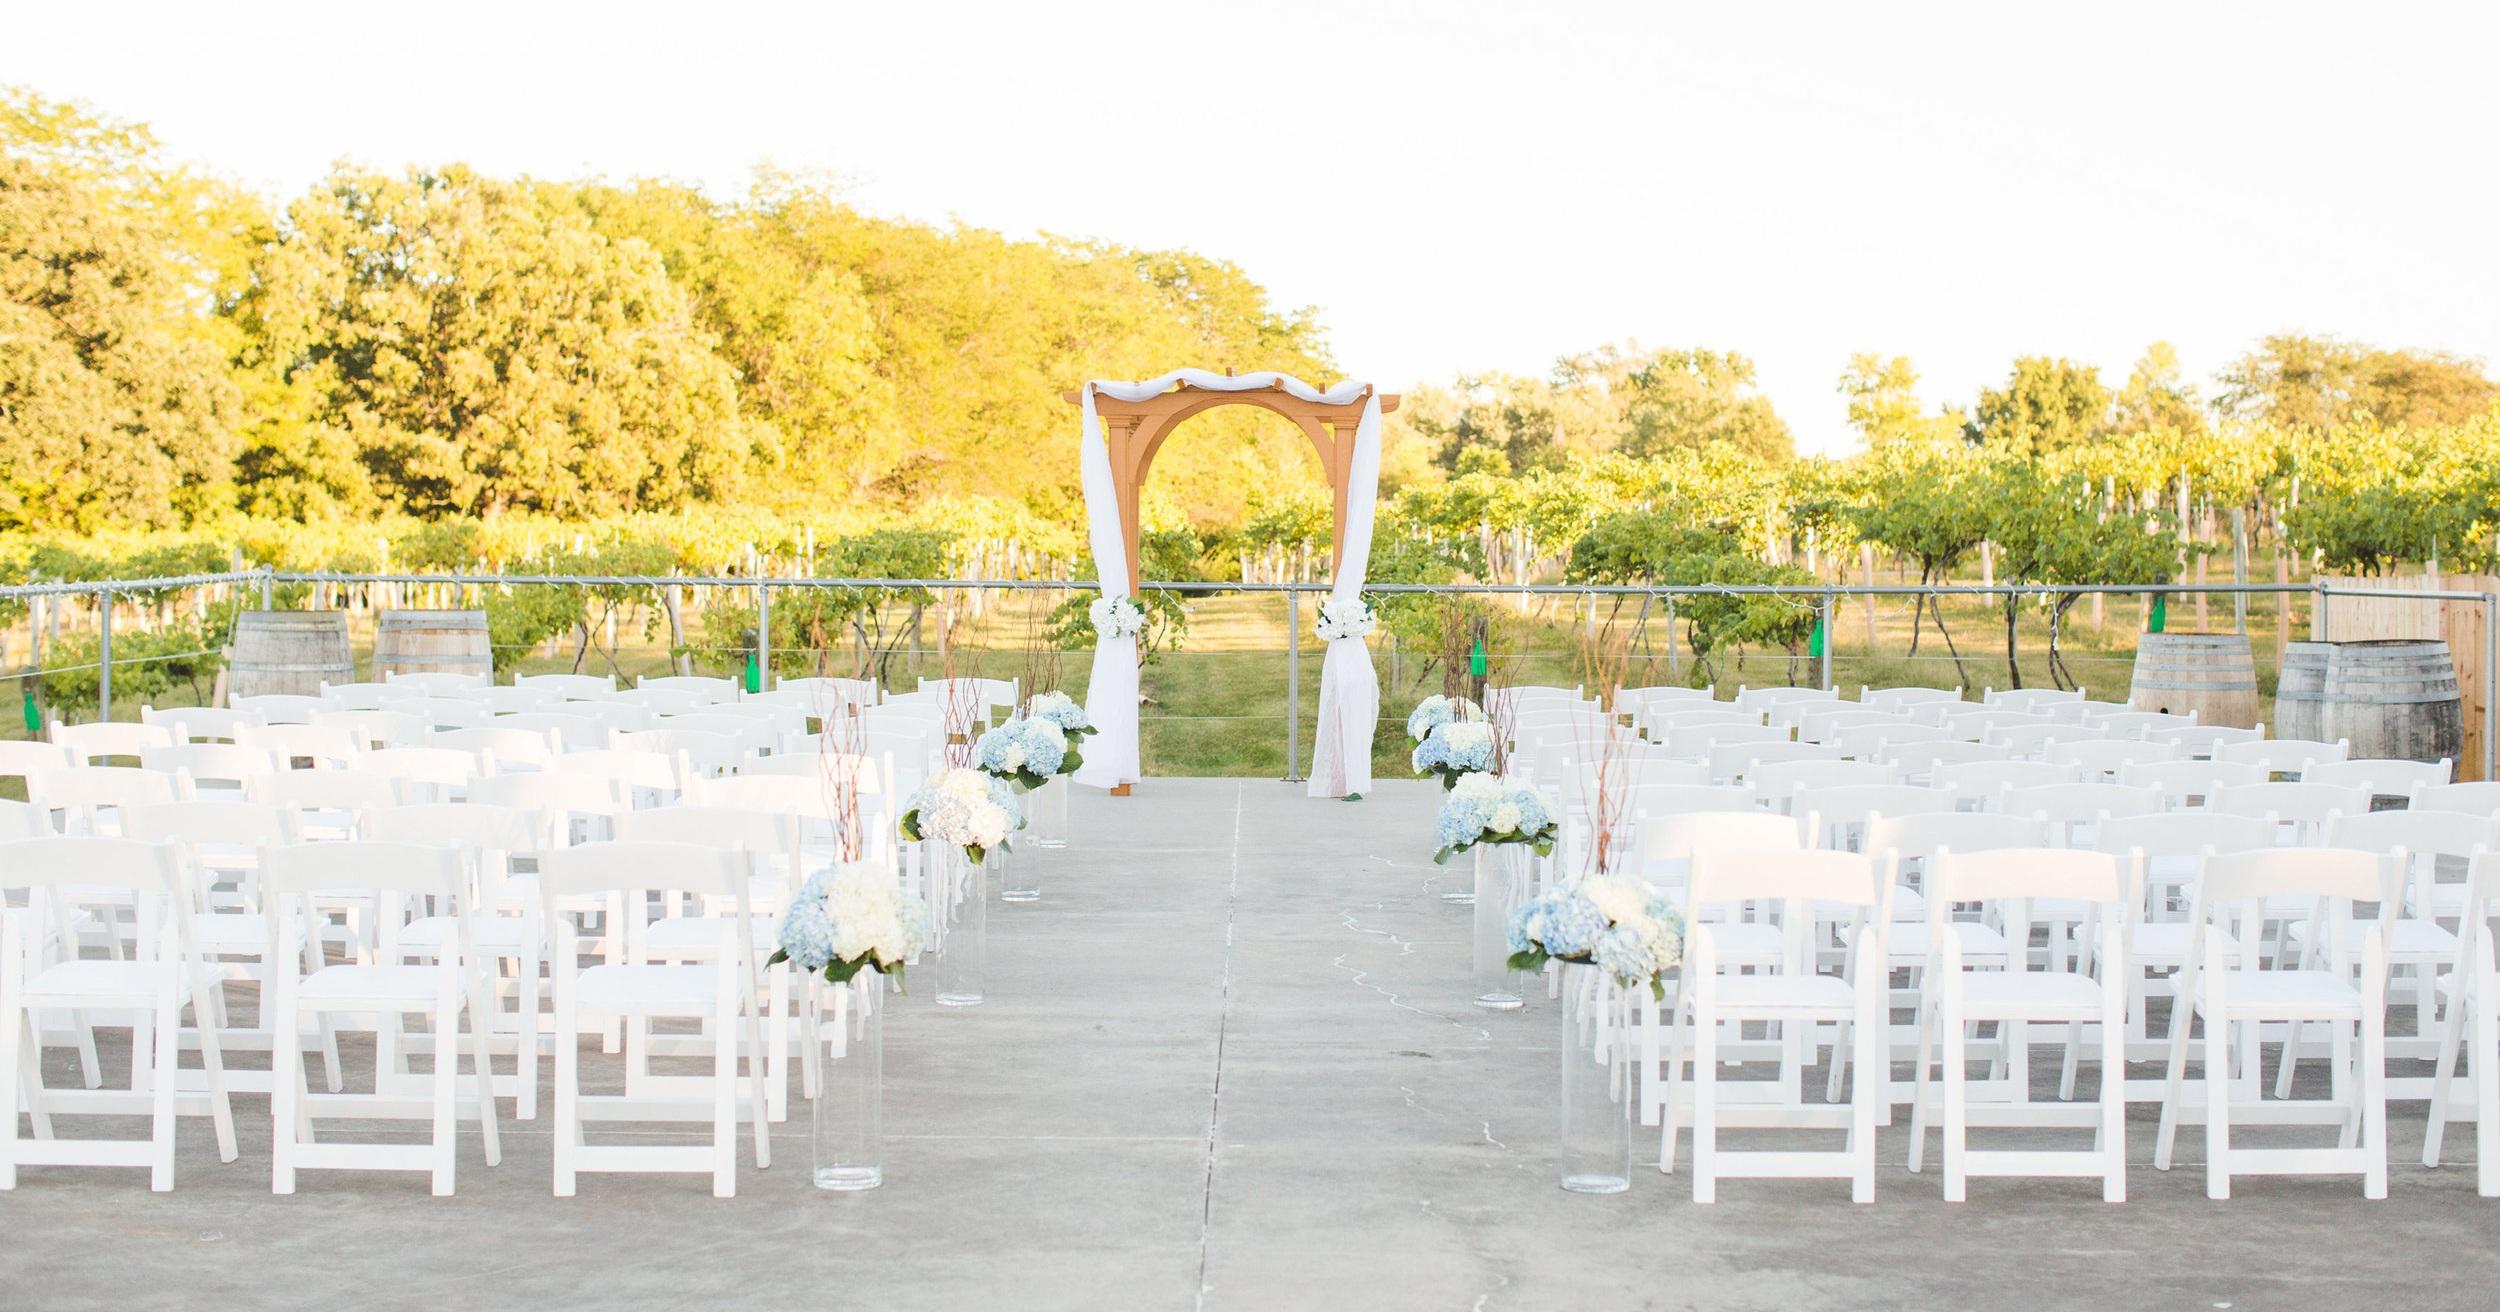 Aly Caroll outdoor wedding-0403.jpg